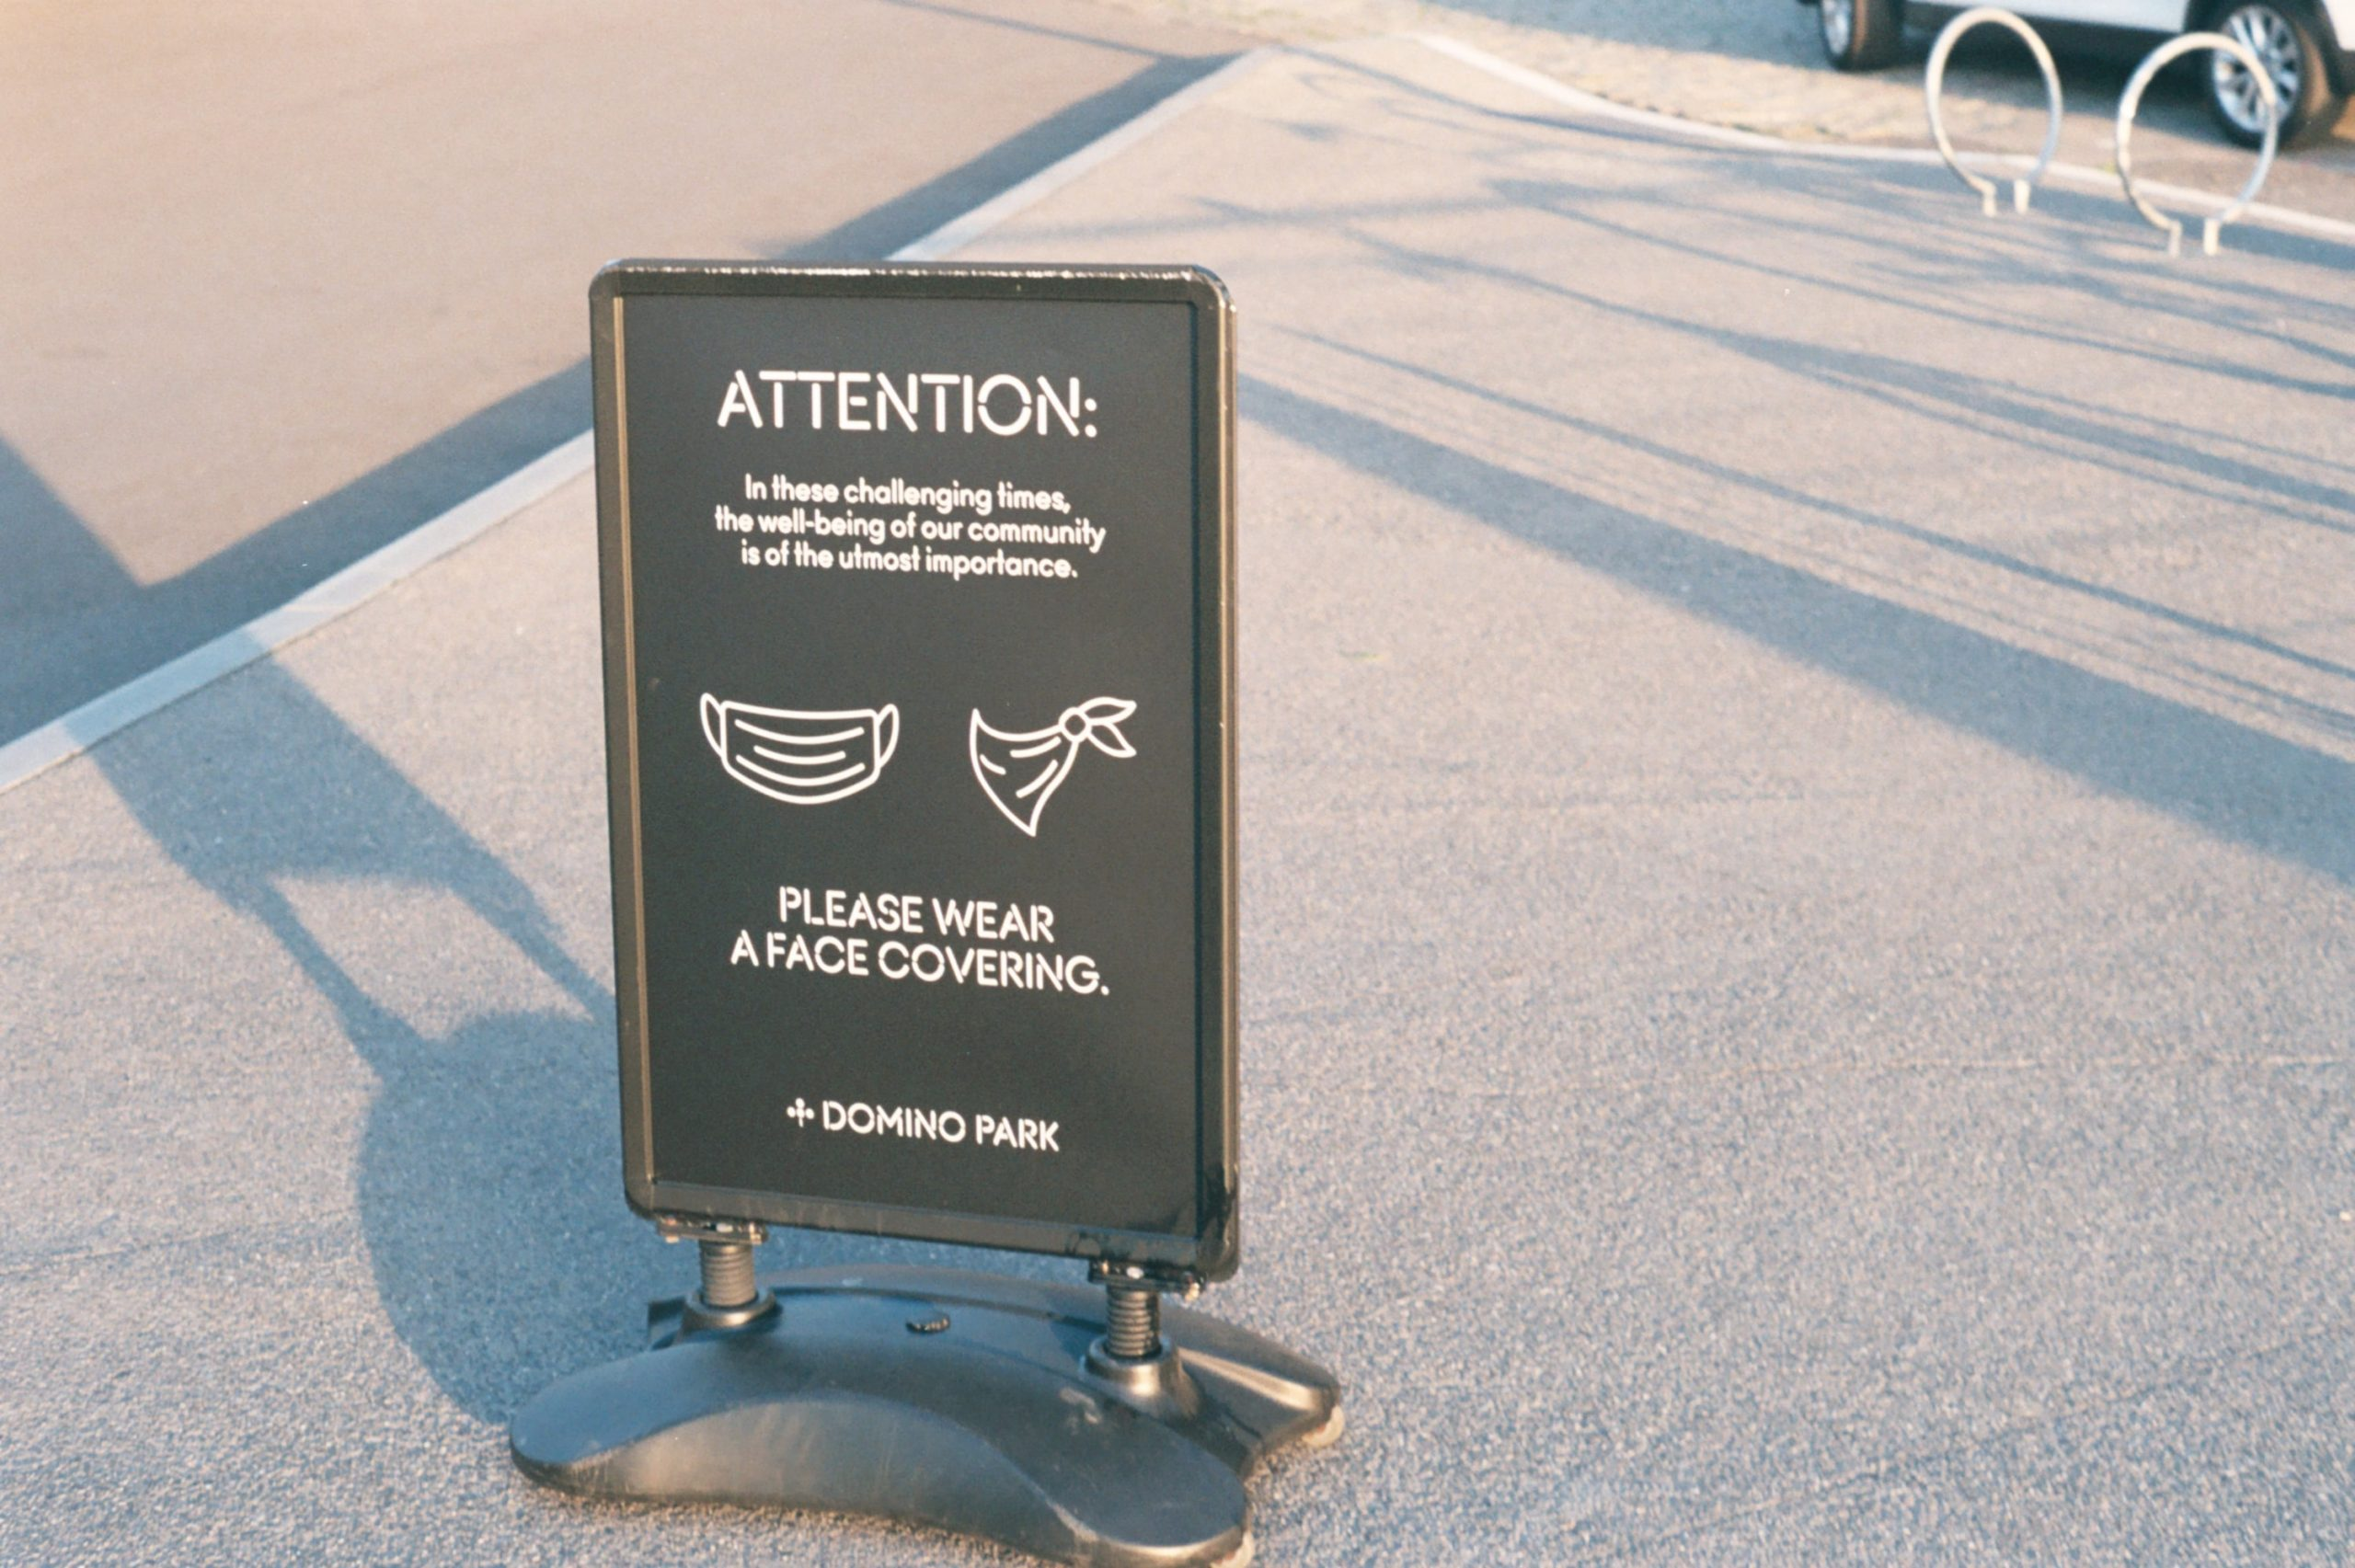 Letrero advirtiendo el uso obligatorio de mascarilla